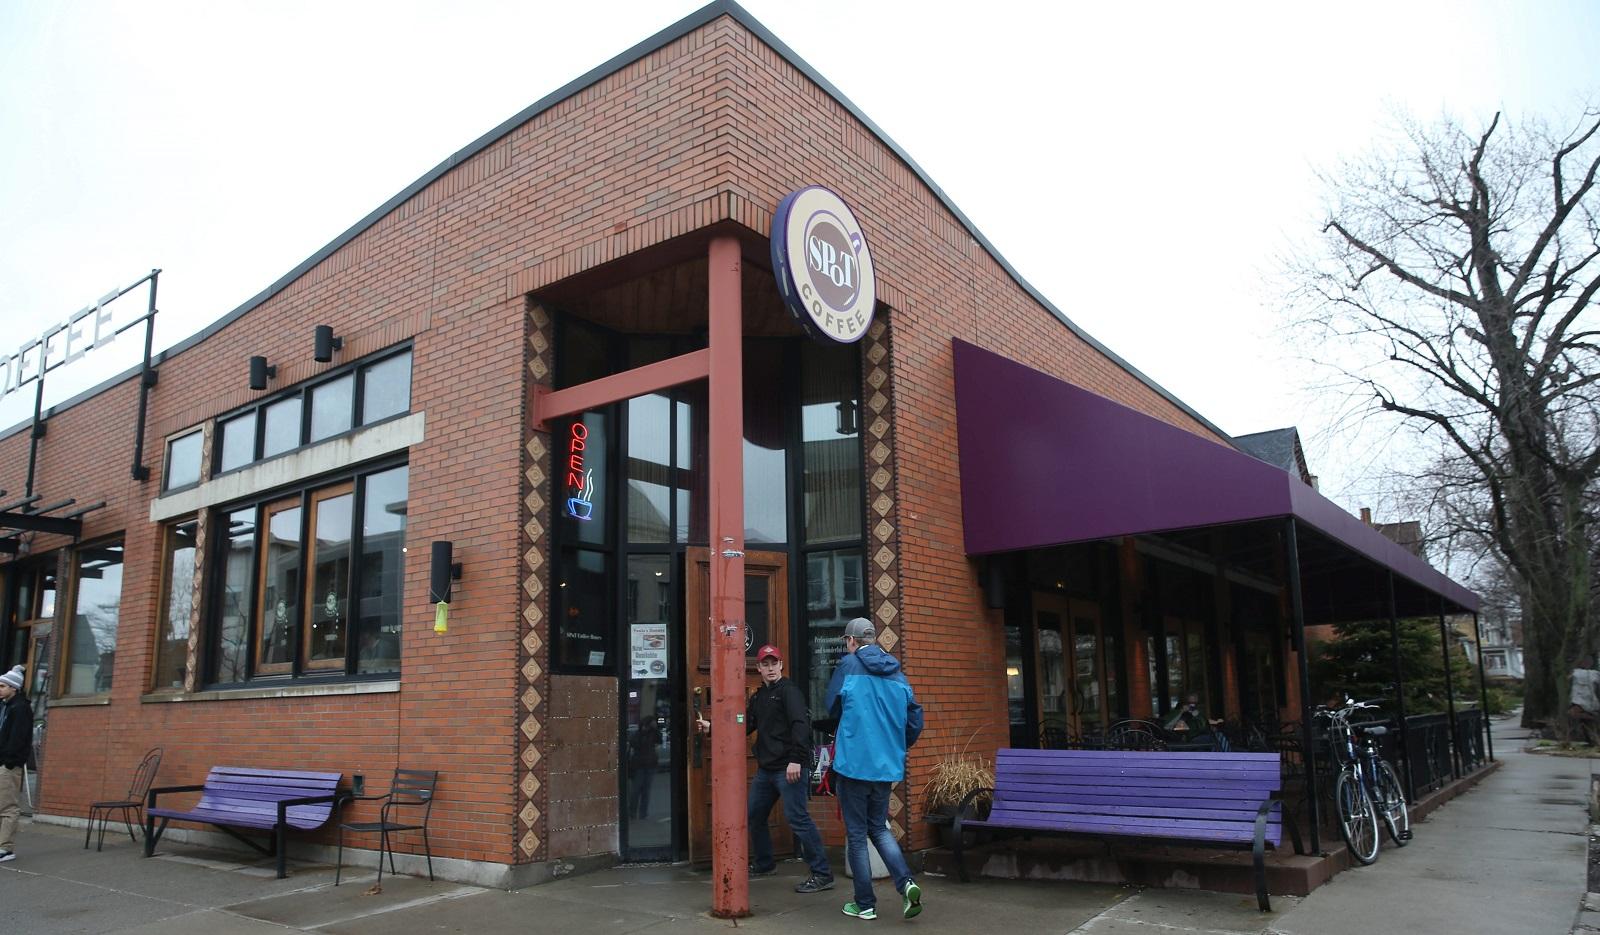 Spot Coffee's location at 765 Elmwood Ave. (Sharon Cantillon/Buffalo News)